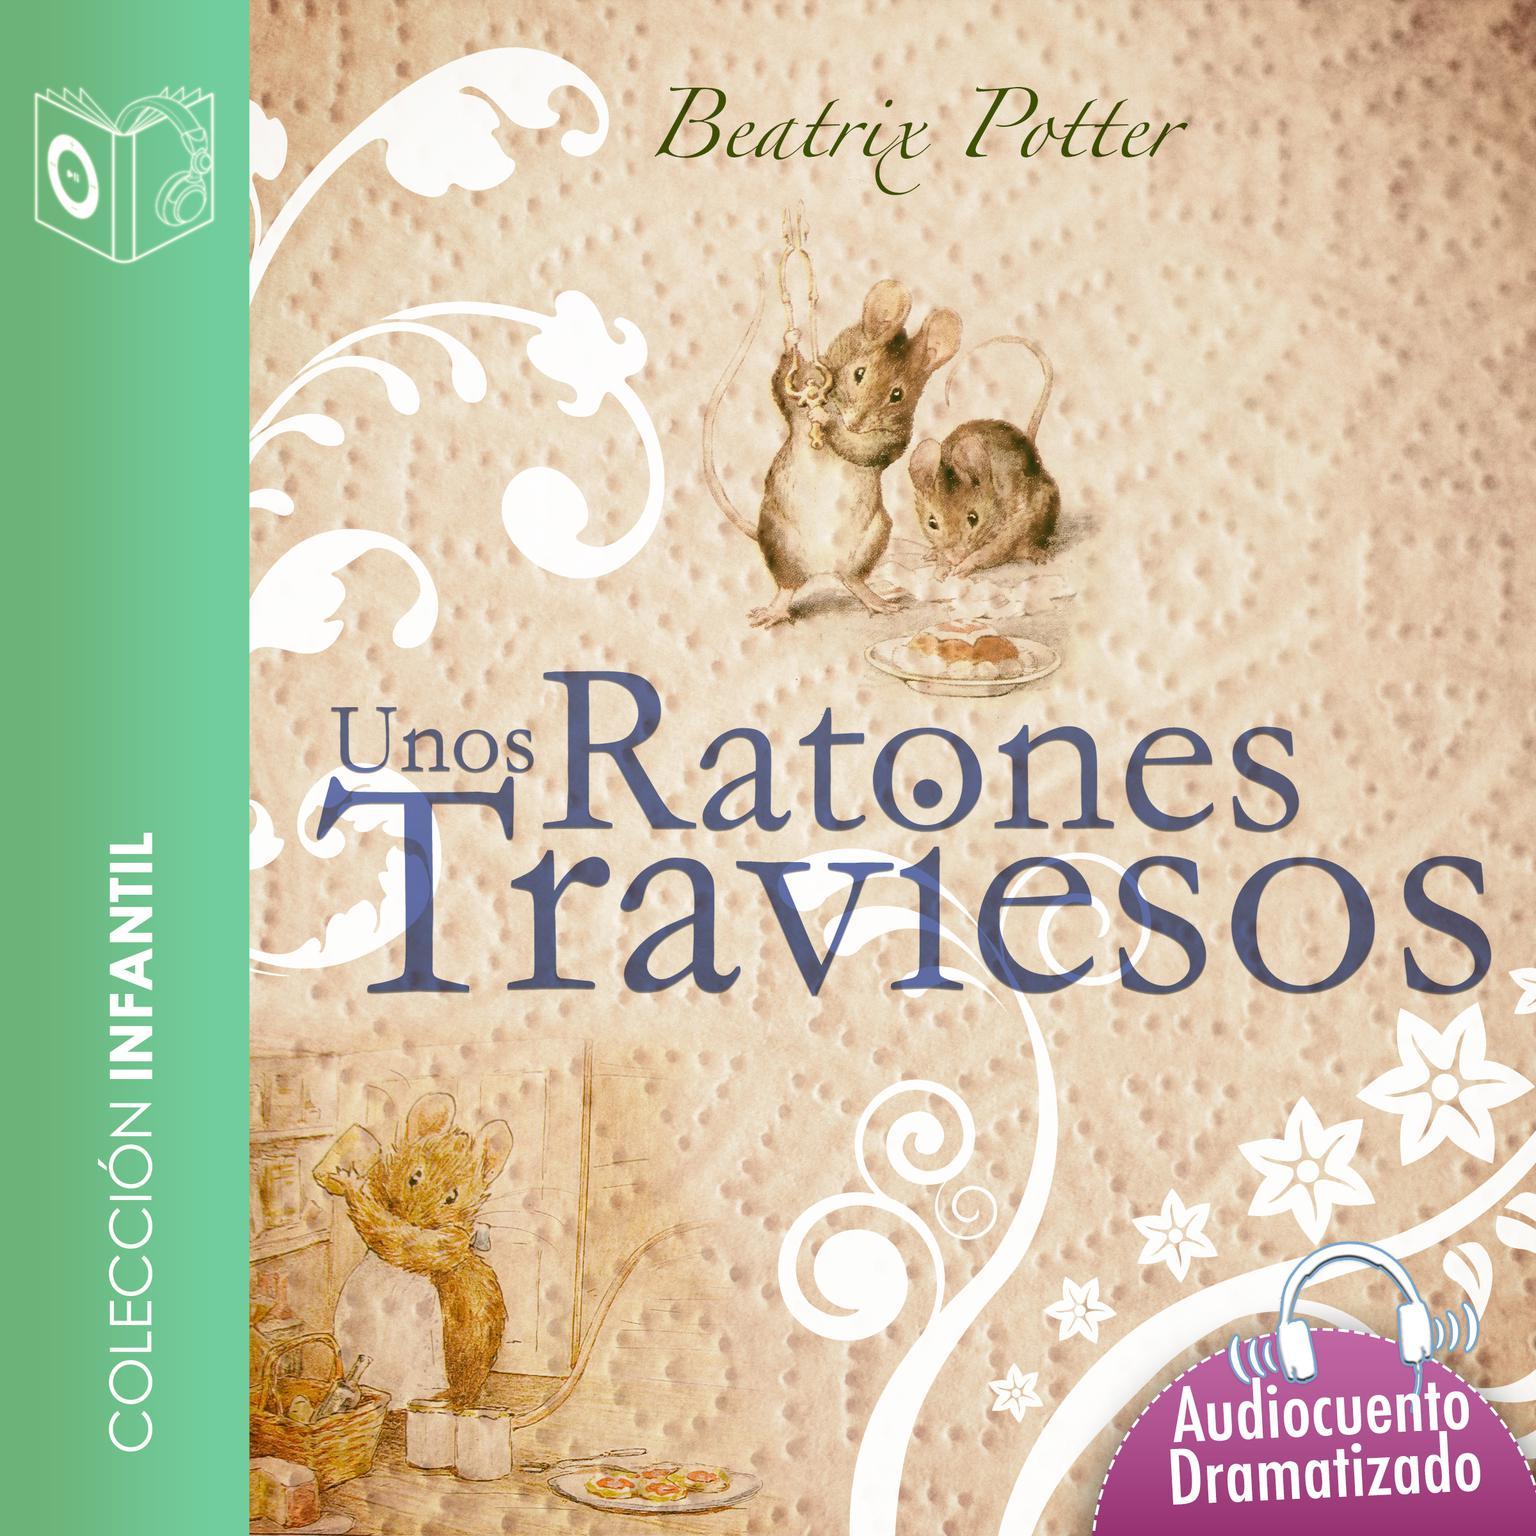 Unos ratones traviesos Audiobook, by Beatrix Potter